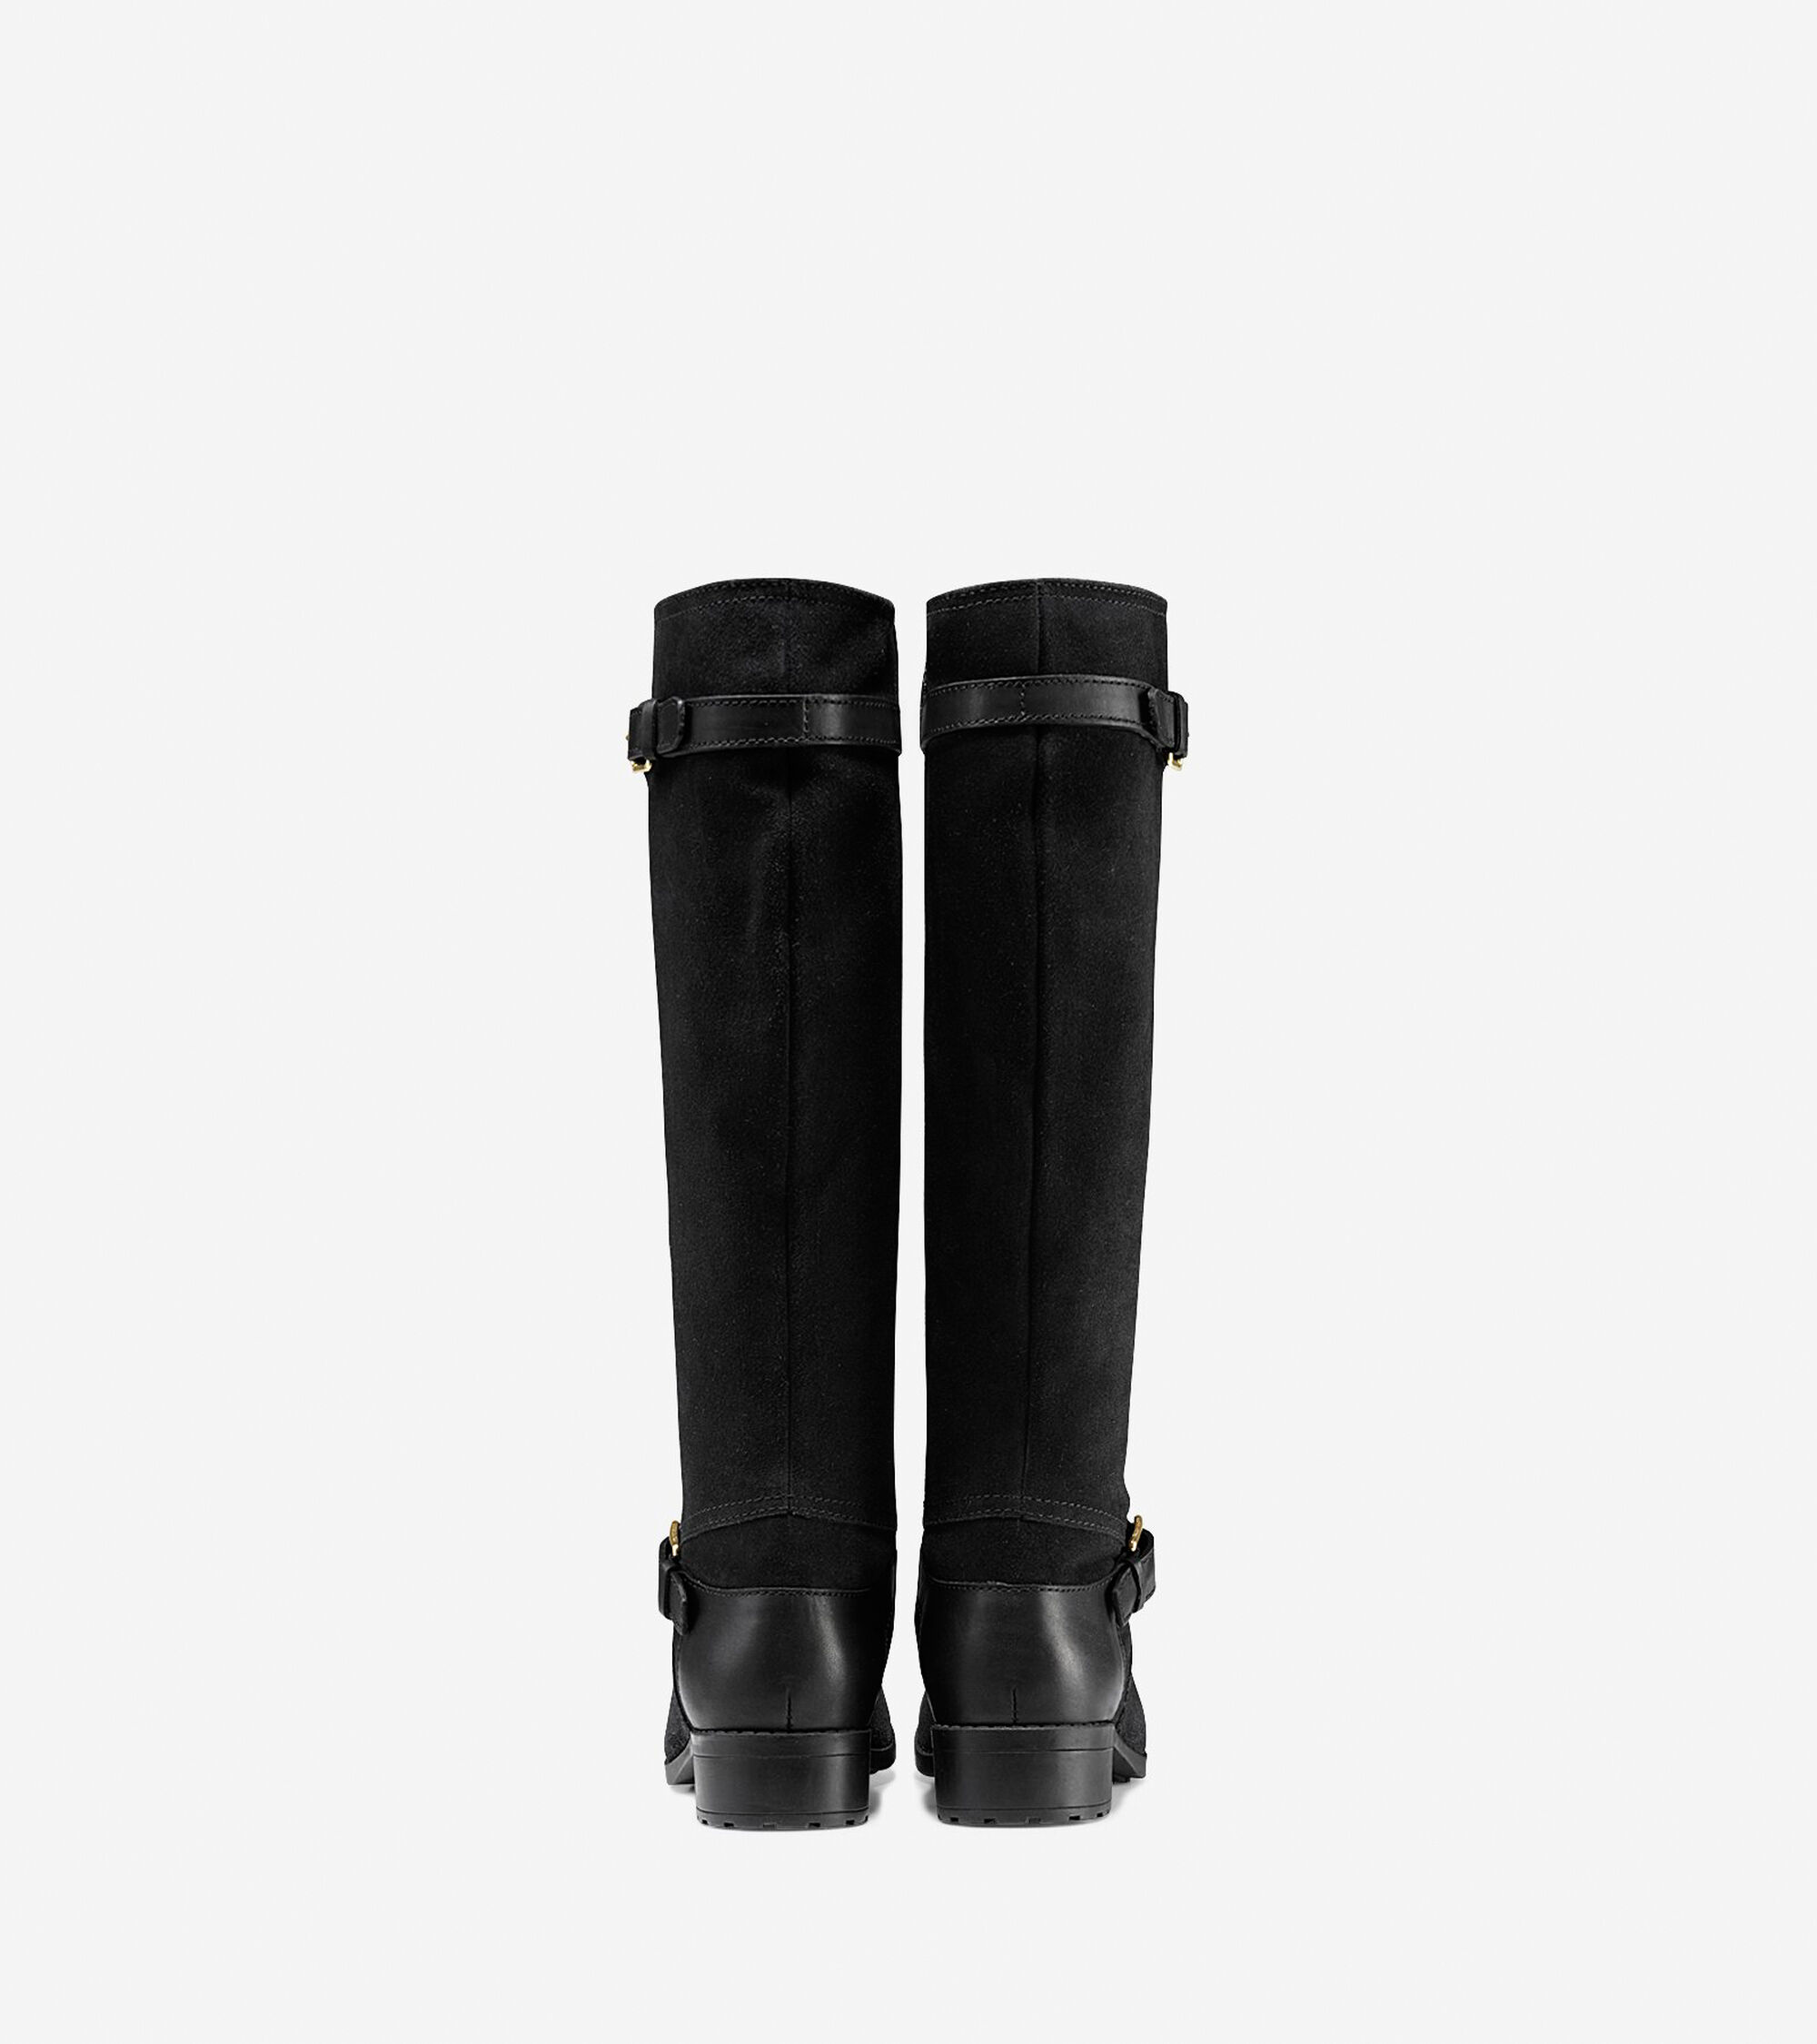 c1d3911c7c3 ... Marla Waterproof Tall Boot (30mm) - Extended Calf ...